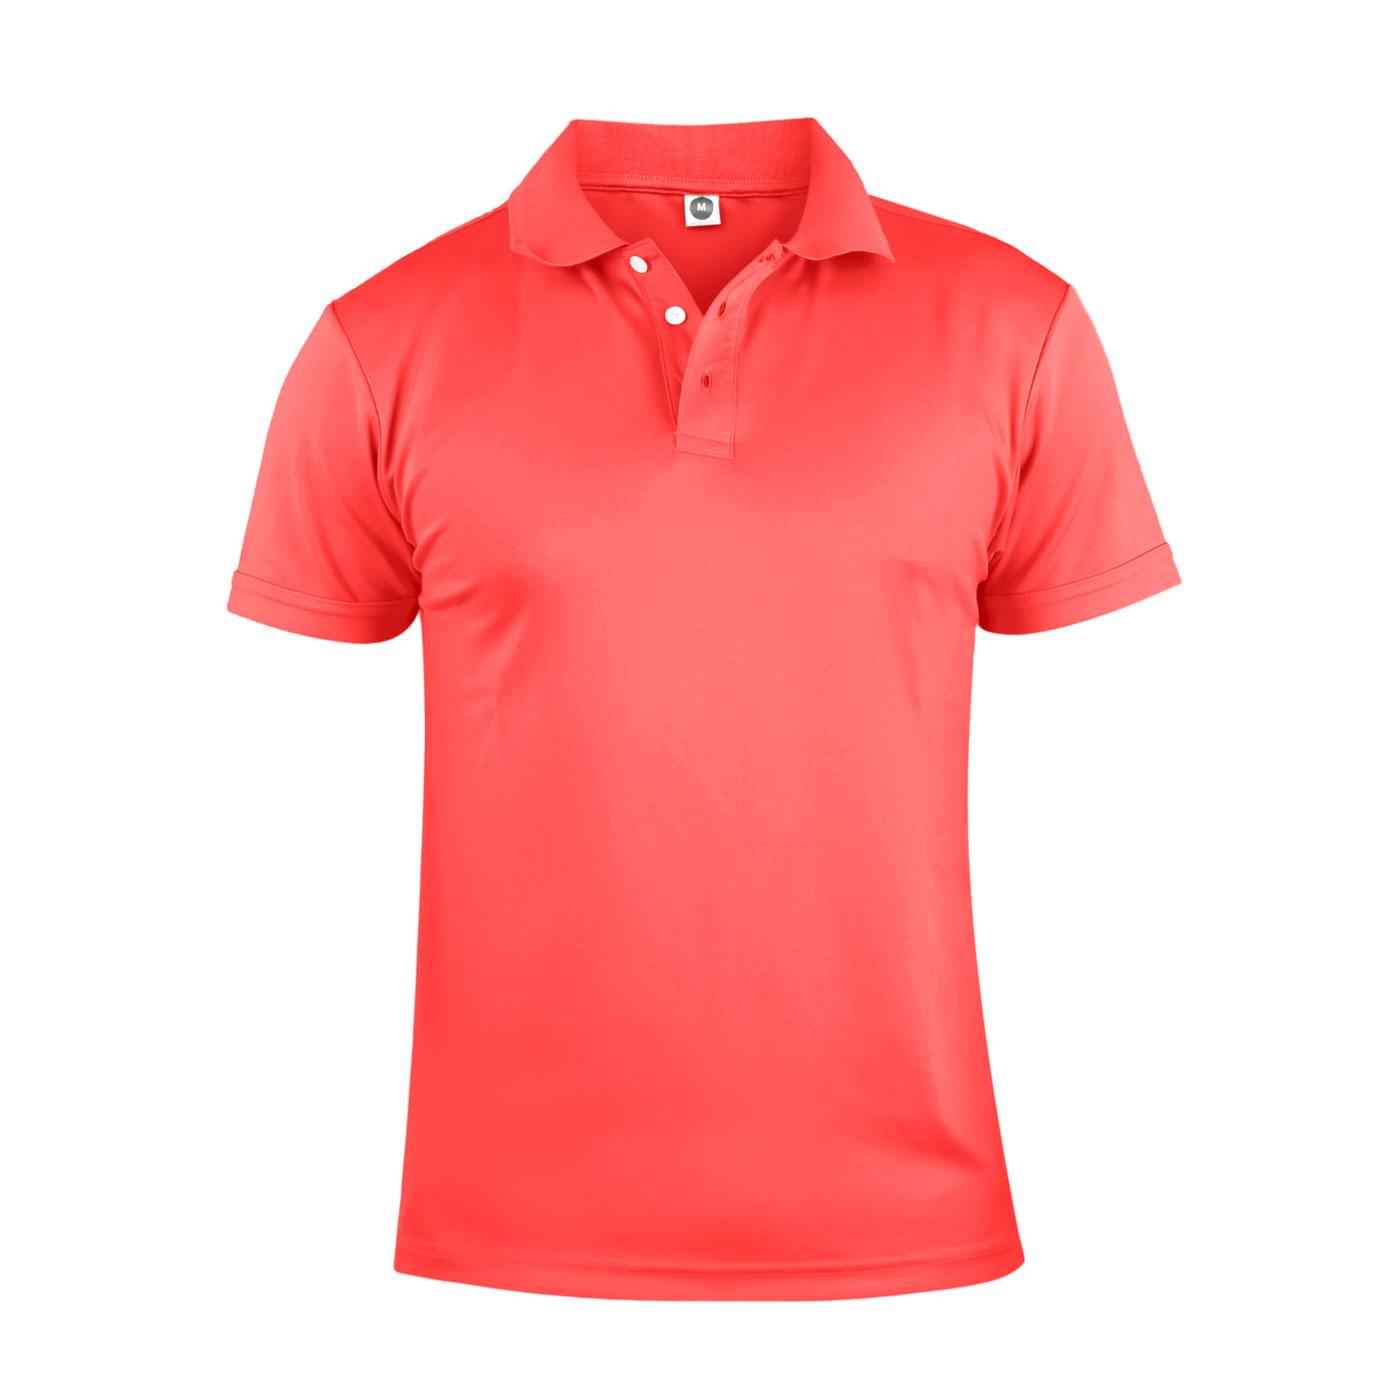 HODARLA 彈力涼感短袖POLO衫 3113901 - 螢光粉